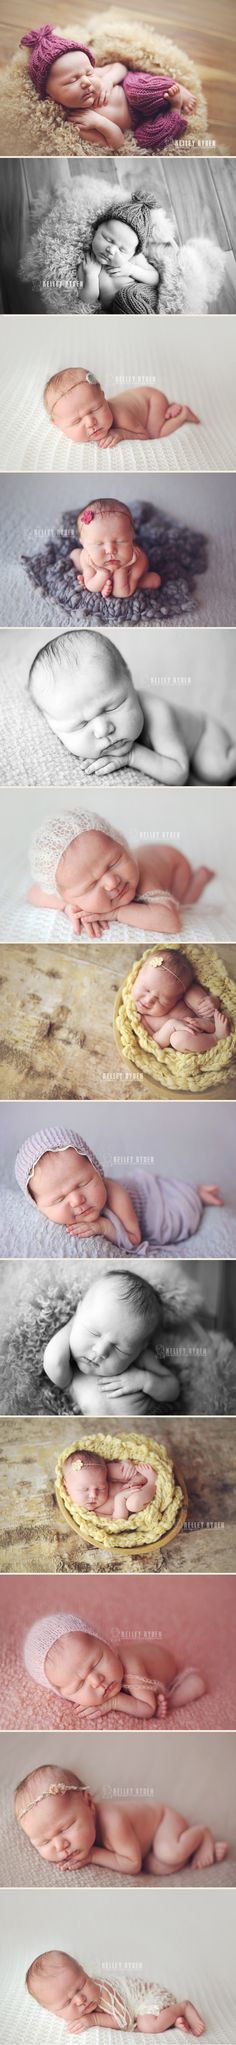 KelleyRydenPhotog_Sadie_newborn_photography